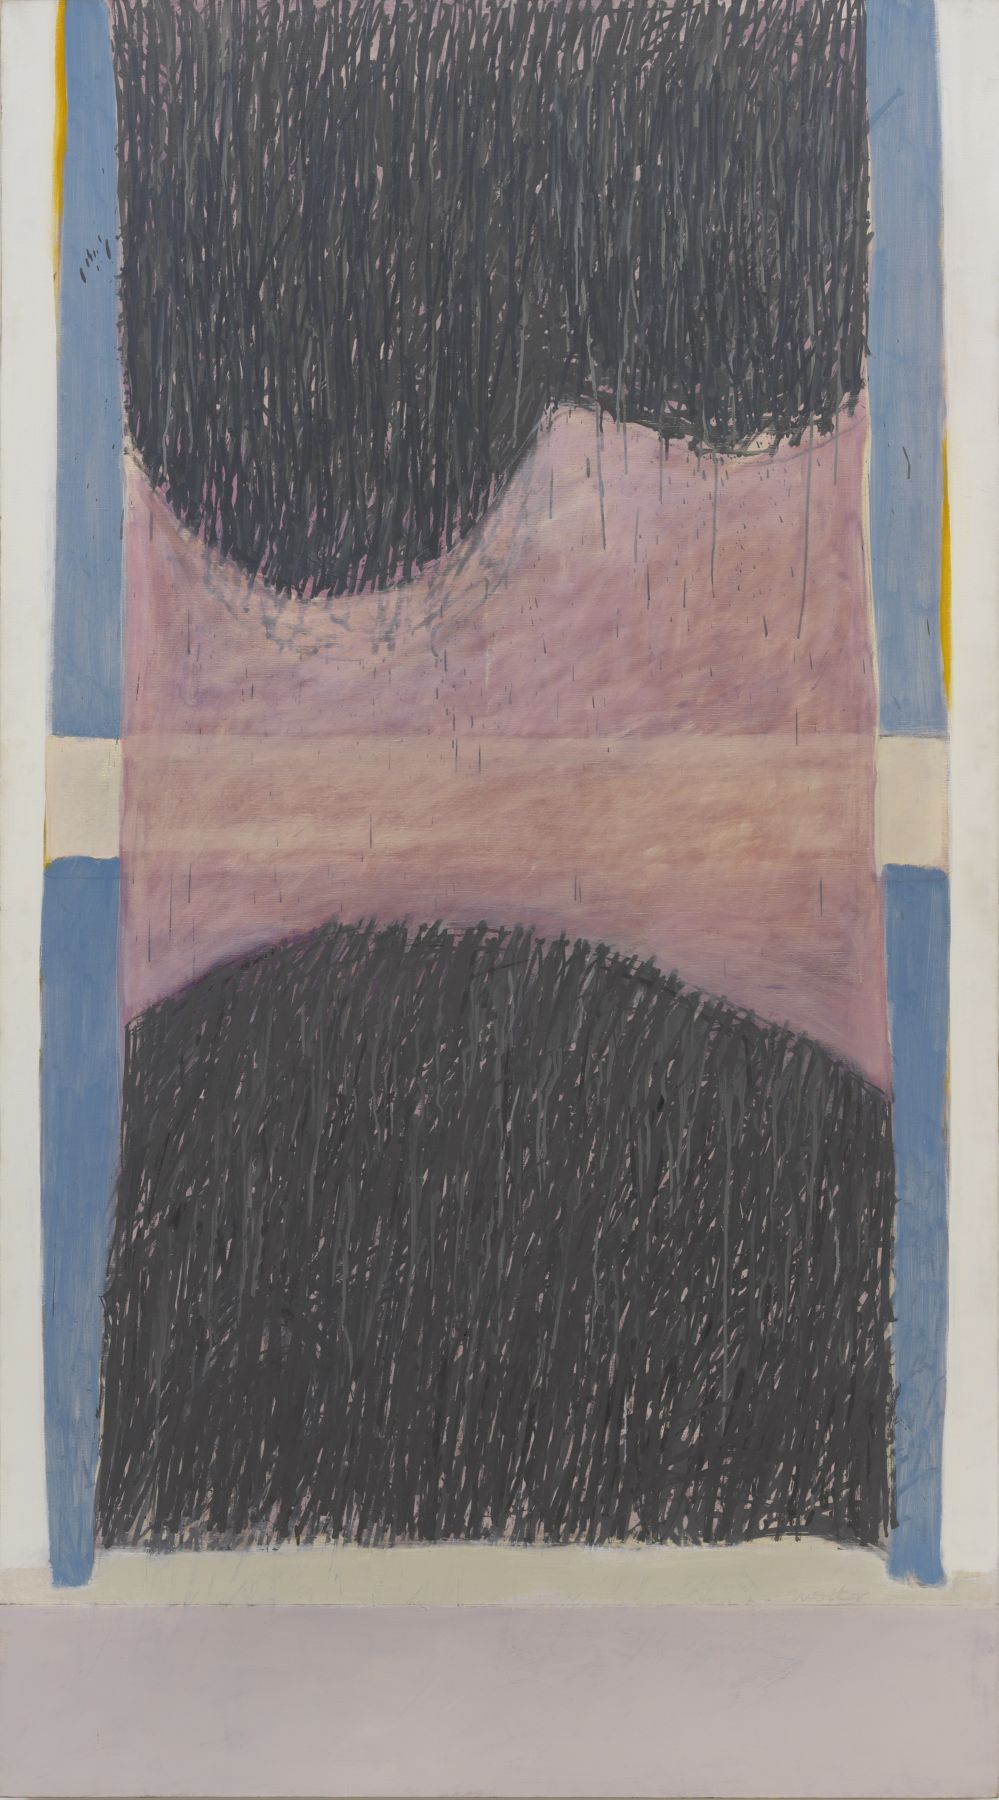 Rime, 1966, Oil on canvas